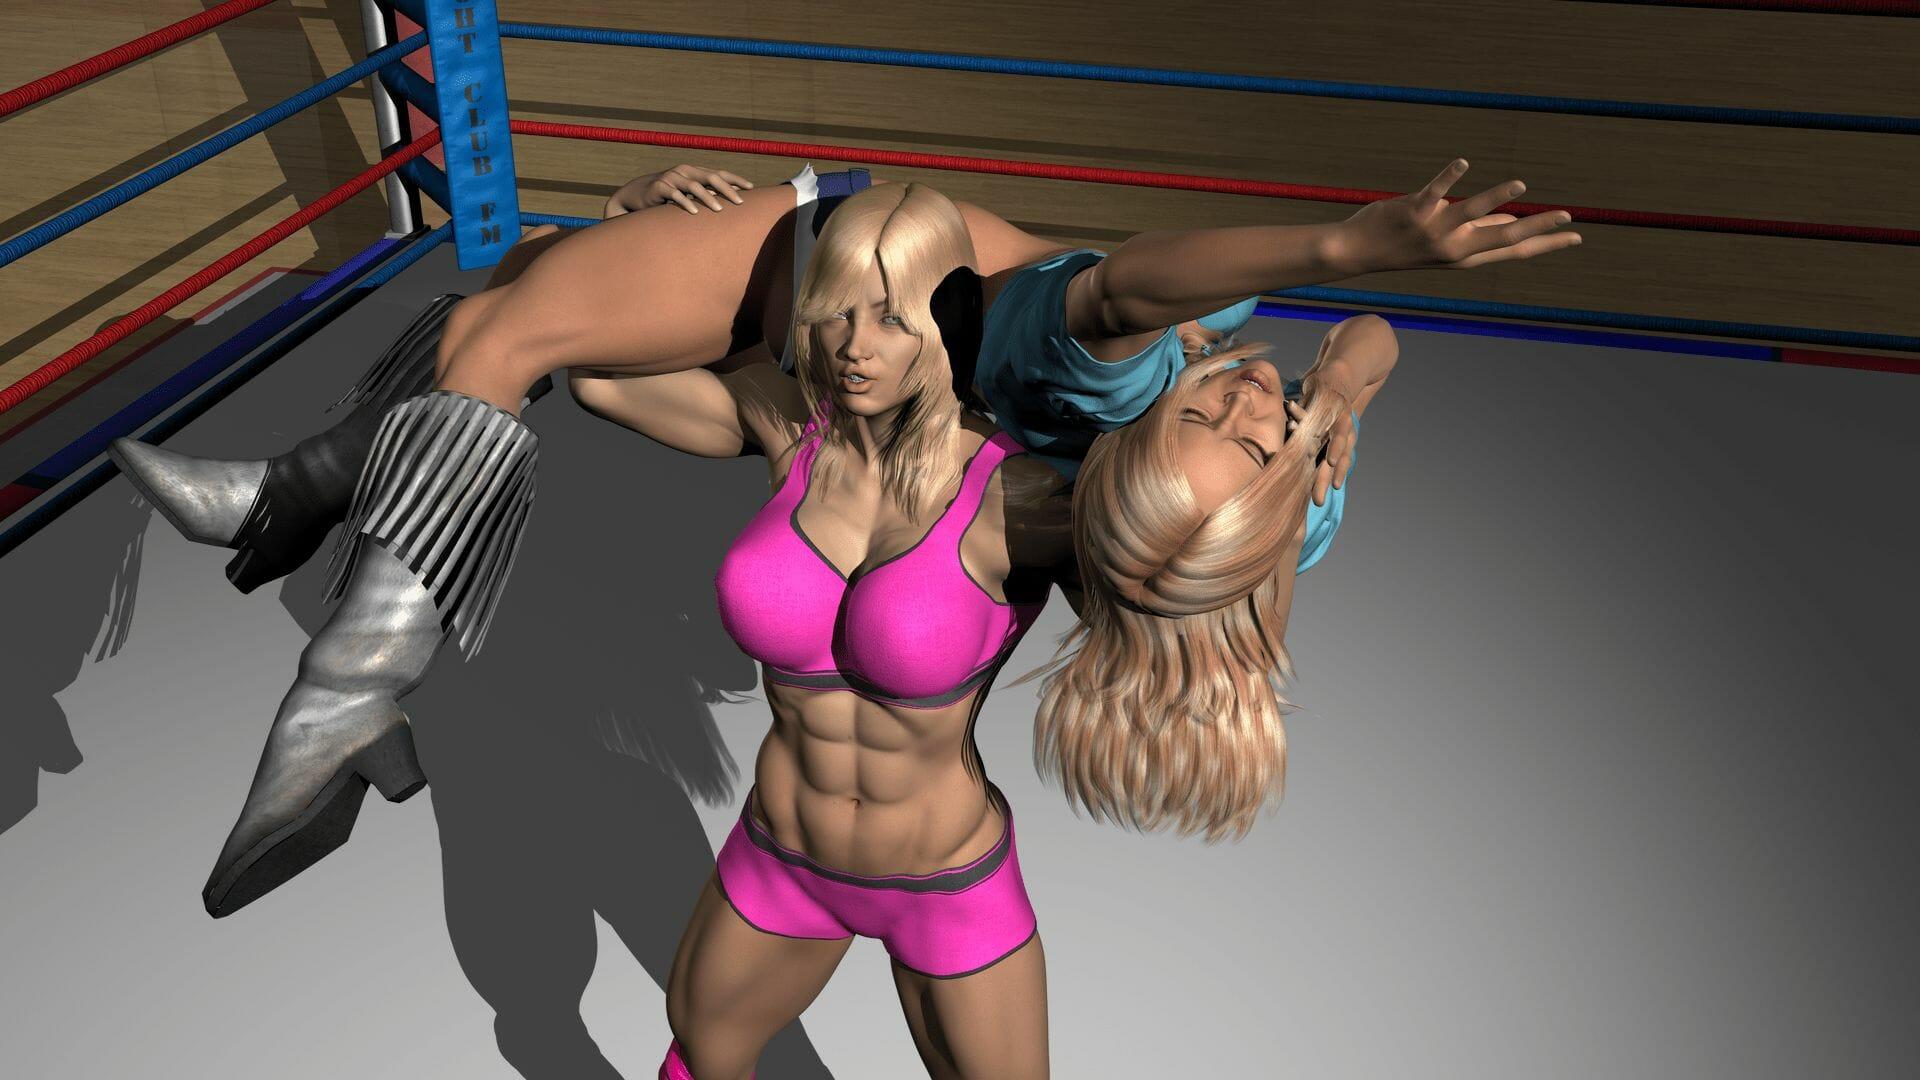 Brooke Lennox vs Brandy Bandt fanart